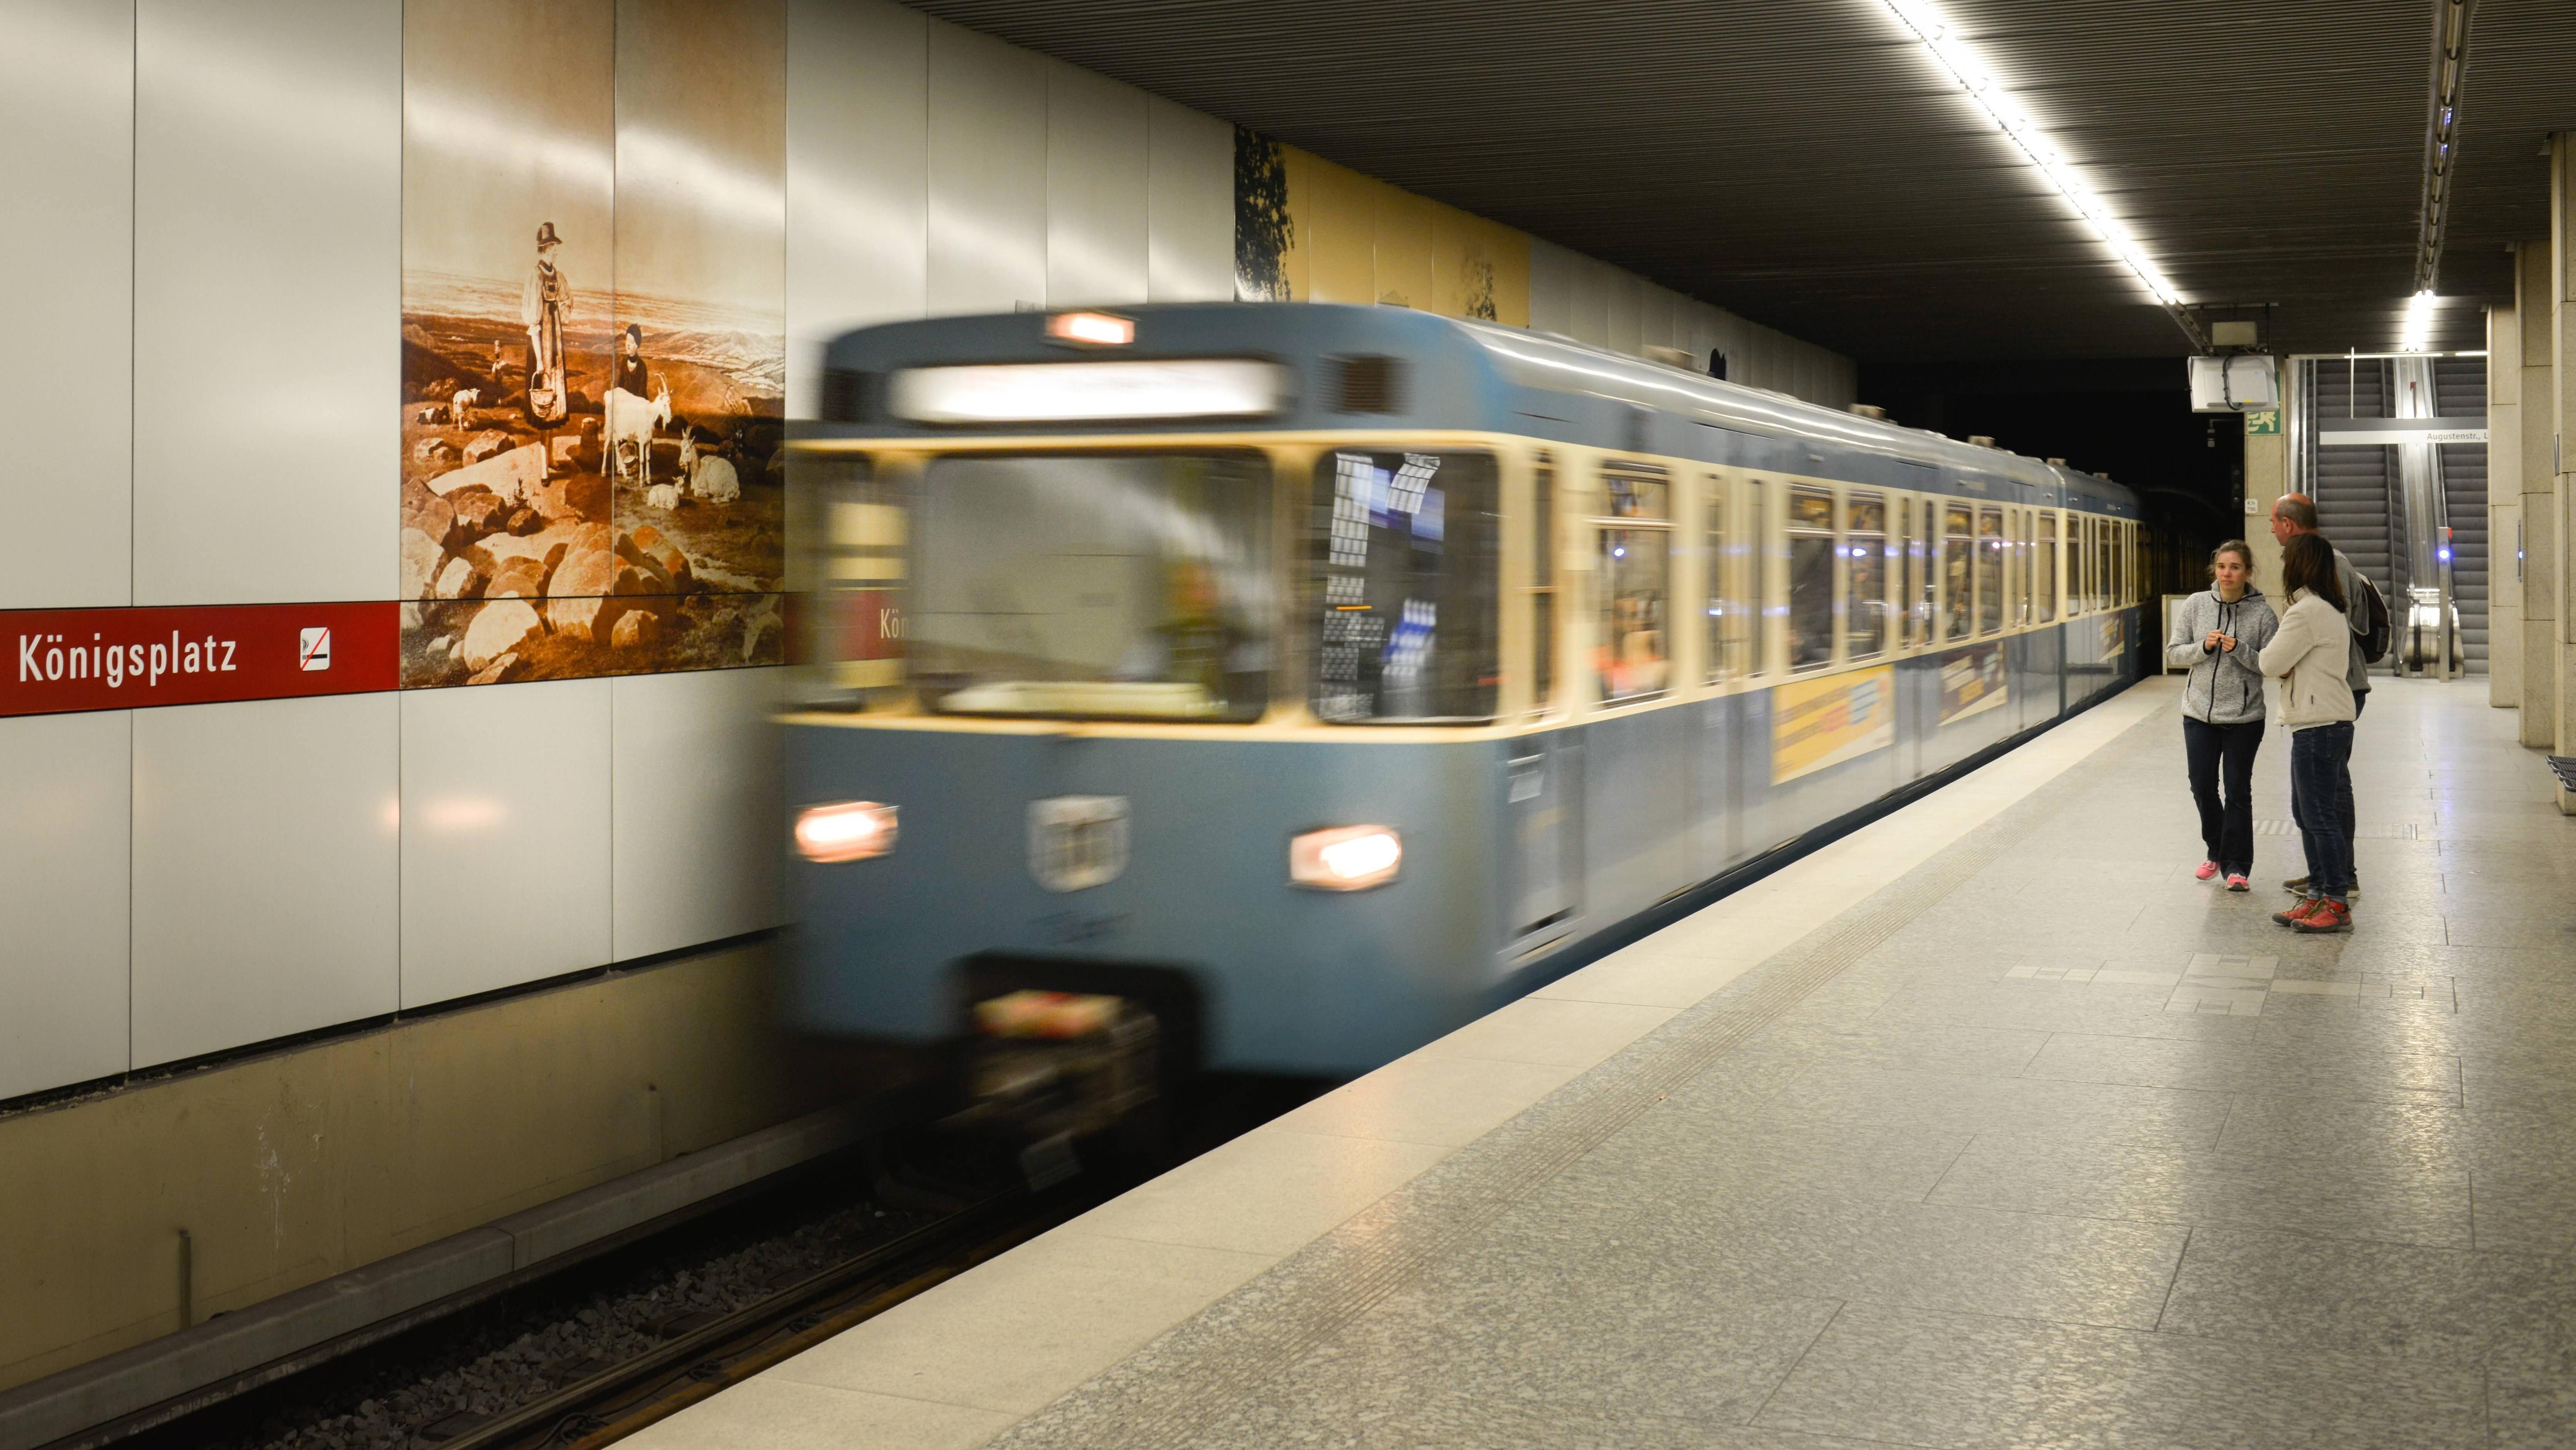 Münchner U-Bahn am Königsplatz